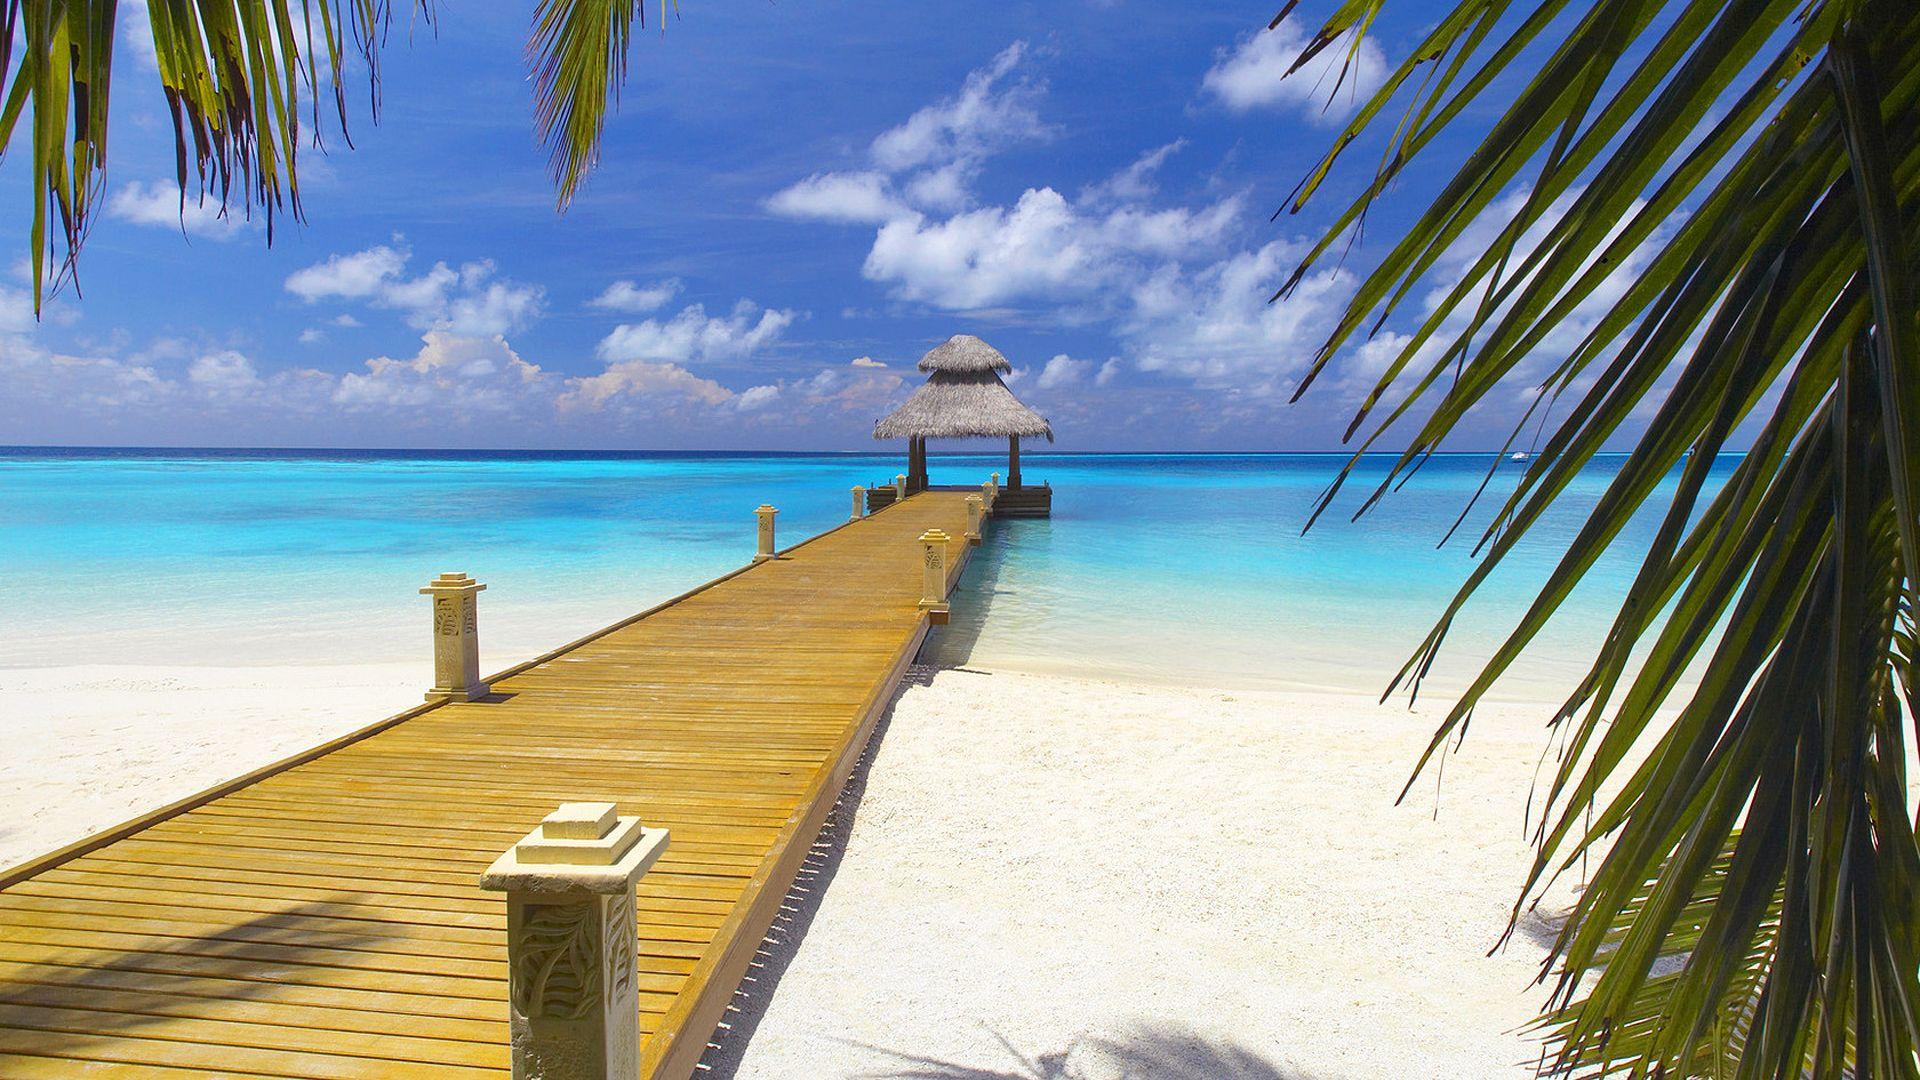 Bahamas desktop background free